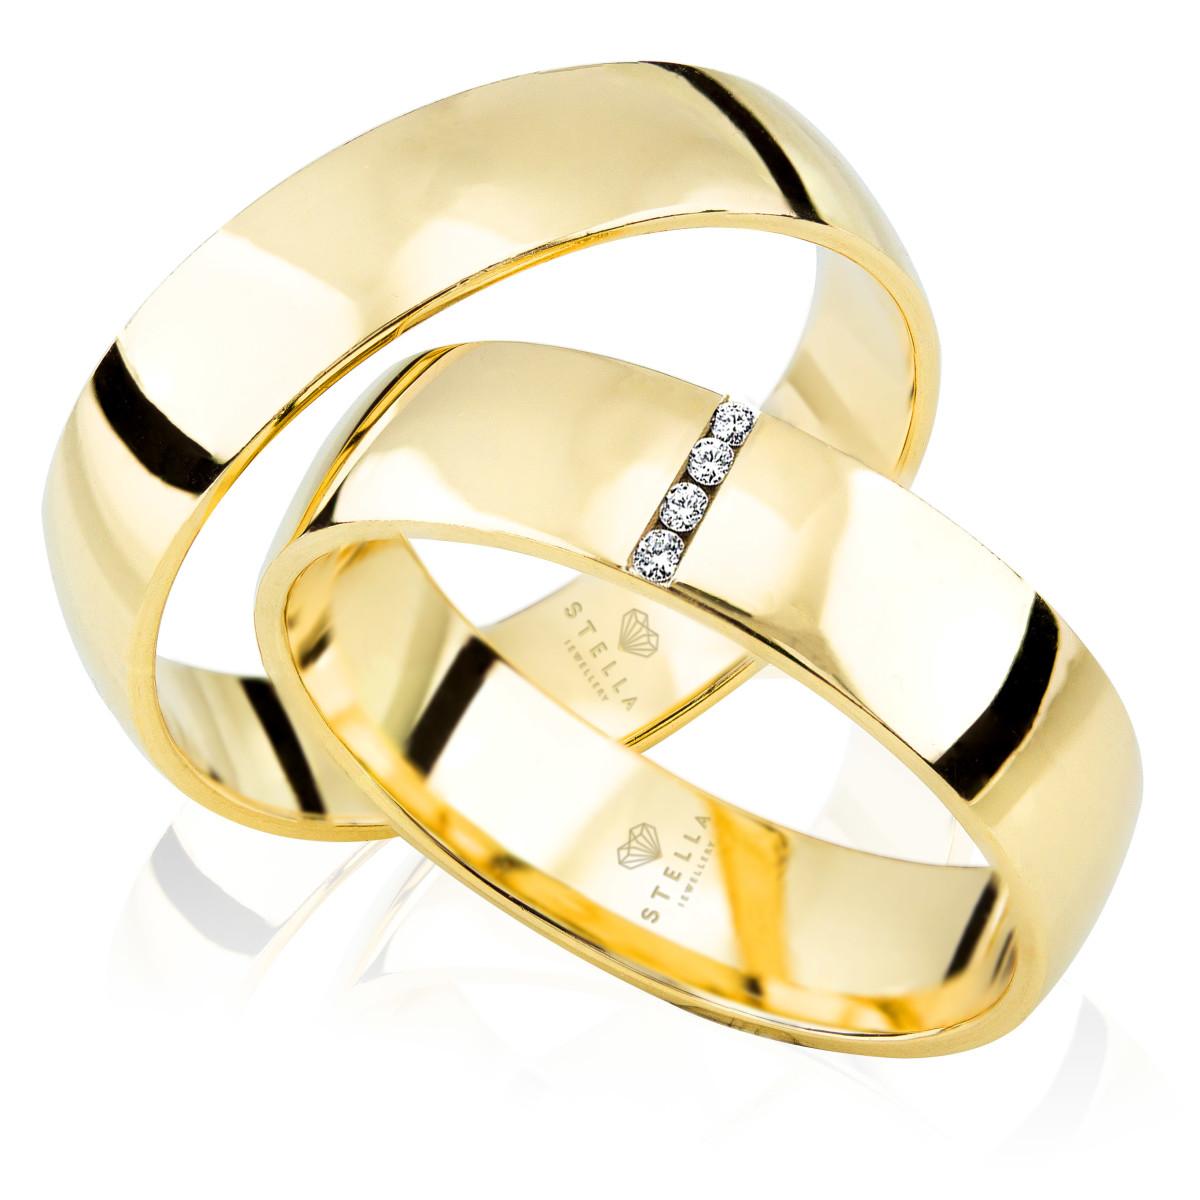 2 Xtrauringe Gg 585 Hochzeitsringe Verlobungsringe Eheringe Gravur Etui 4xzirko